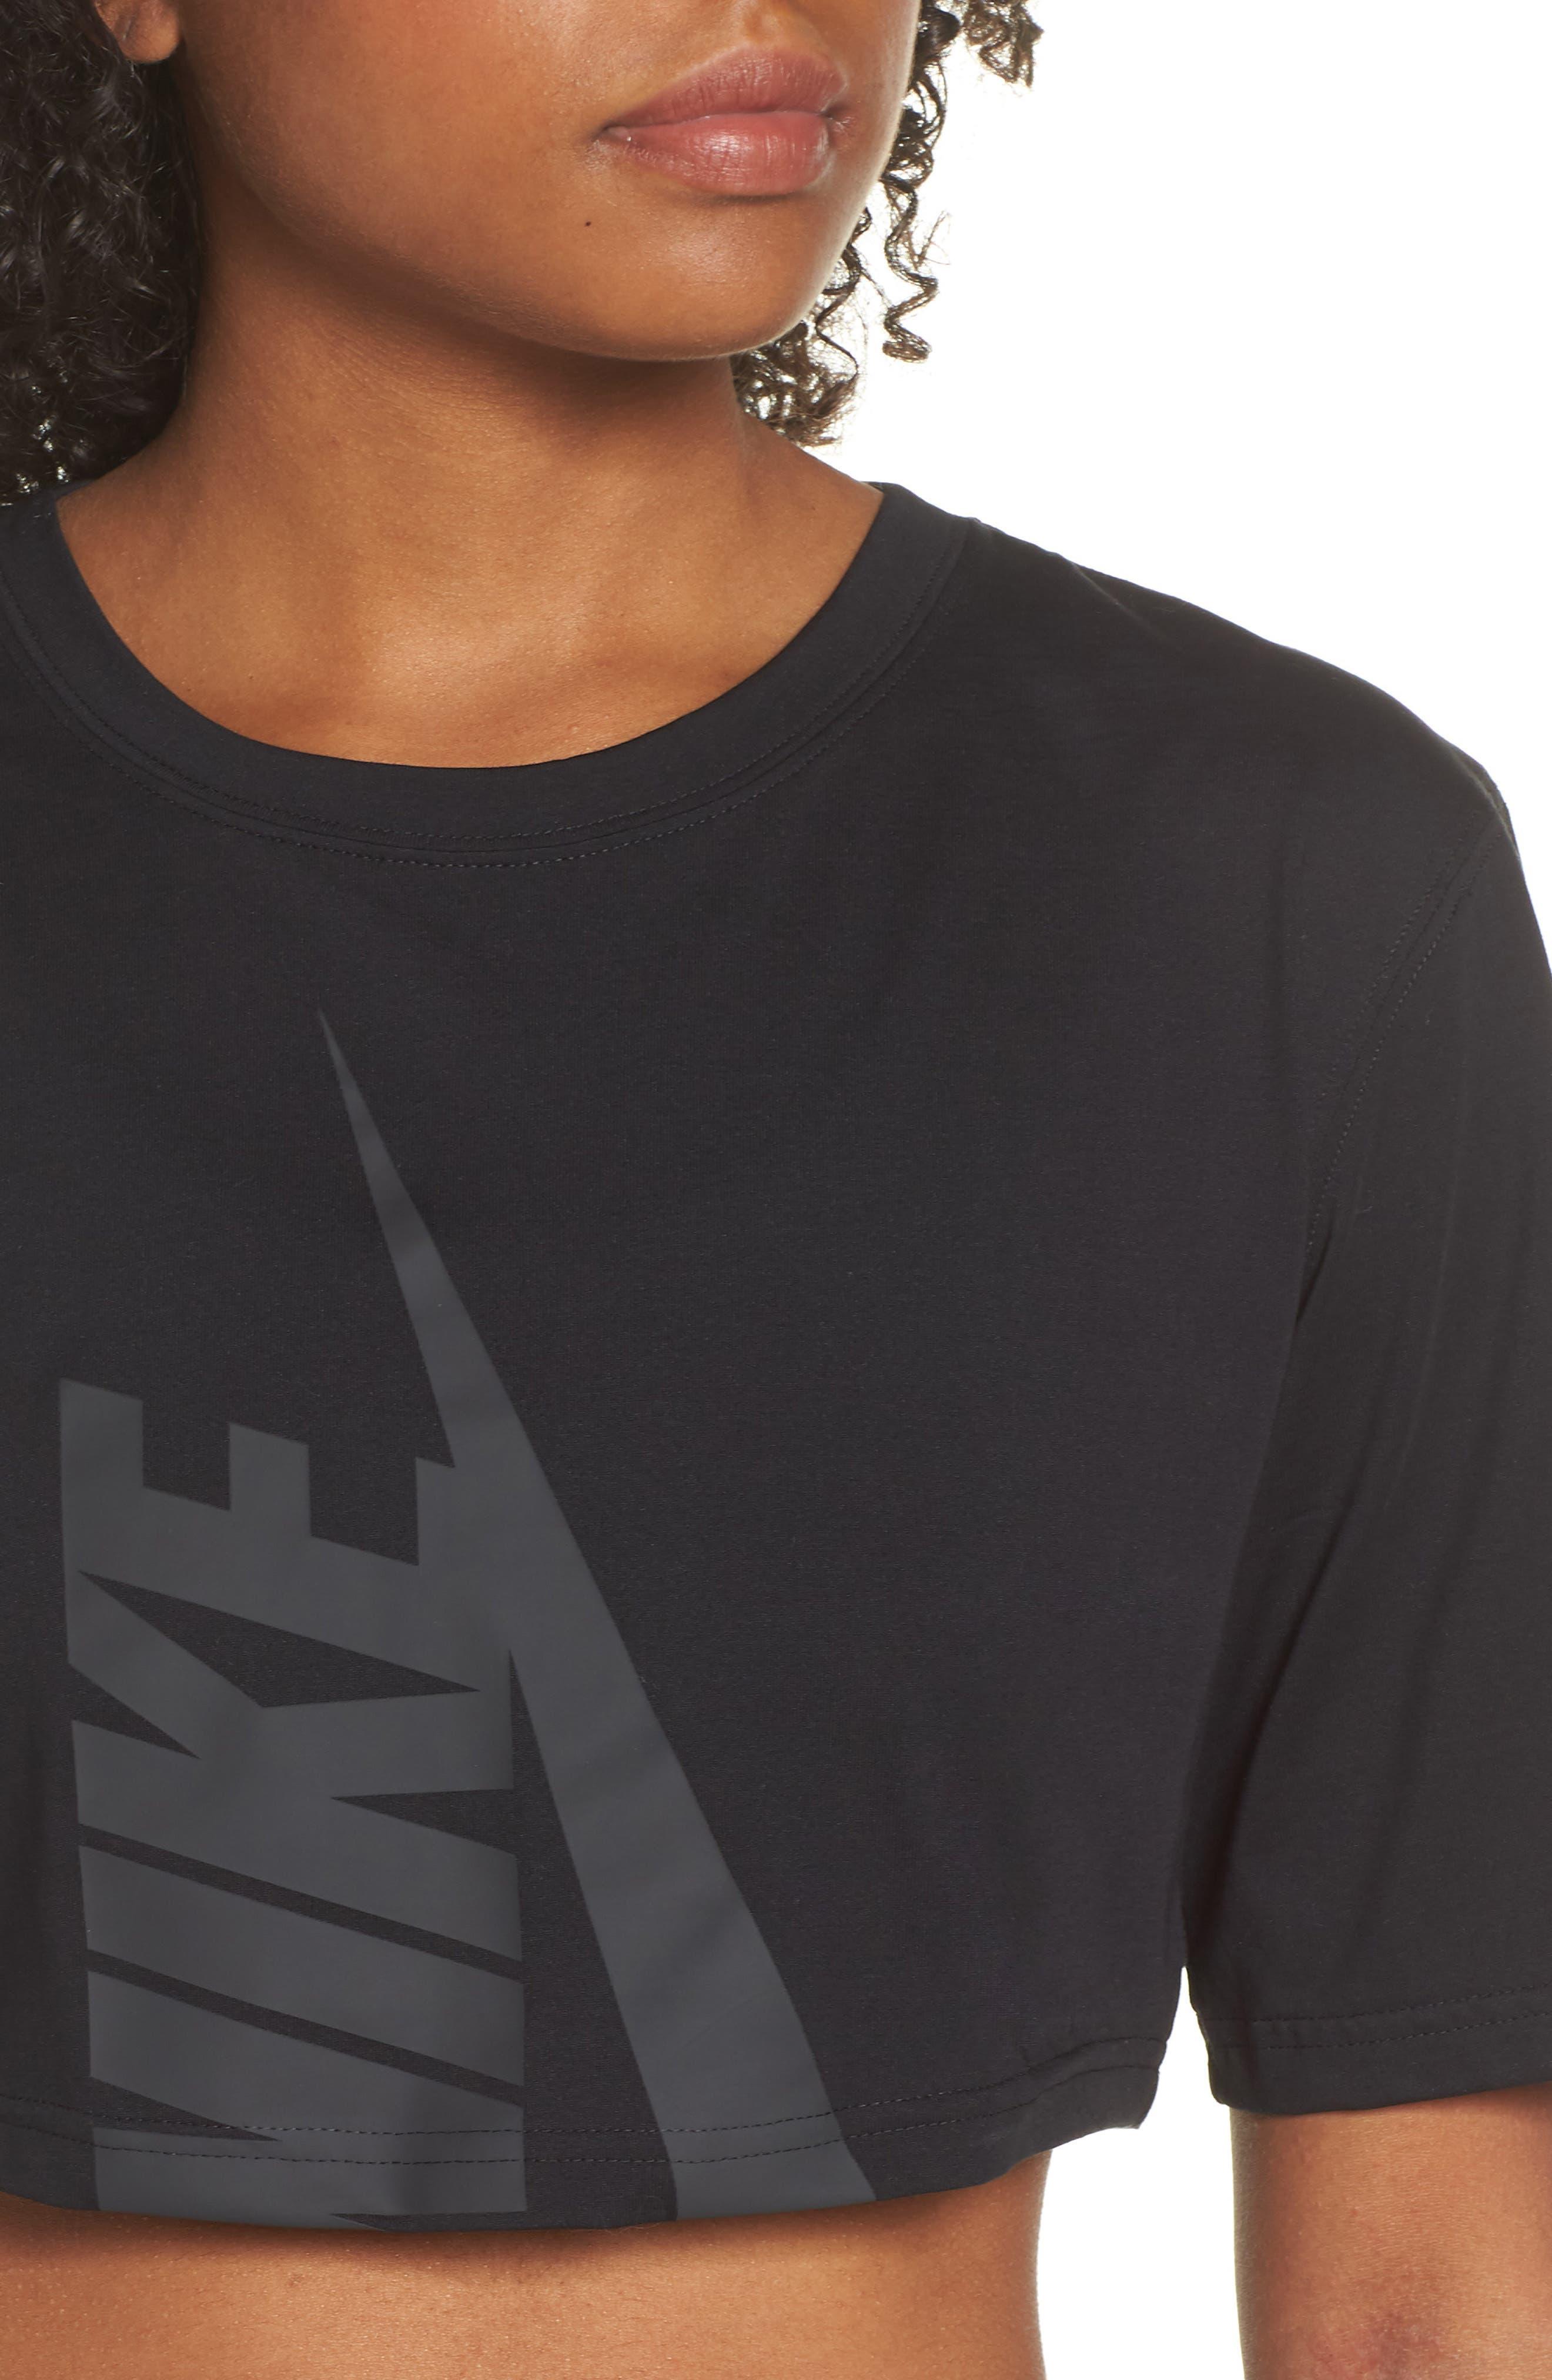 NikeLab Collection Jersey Crop Top,                             Alternate thumbnail 4, color,                             BLACK/ BLACK